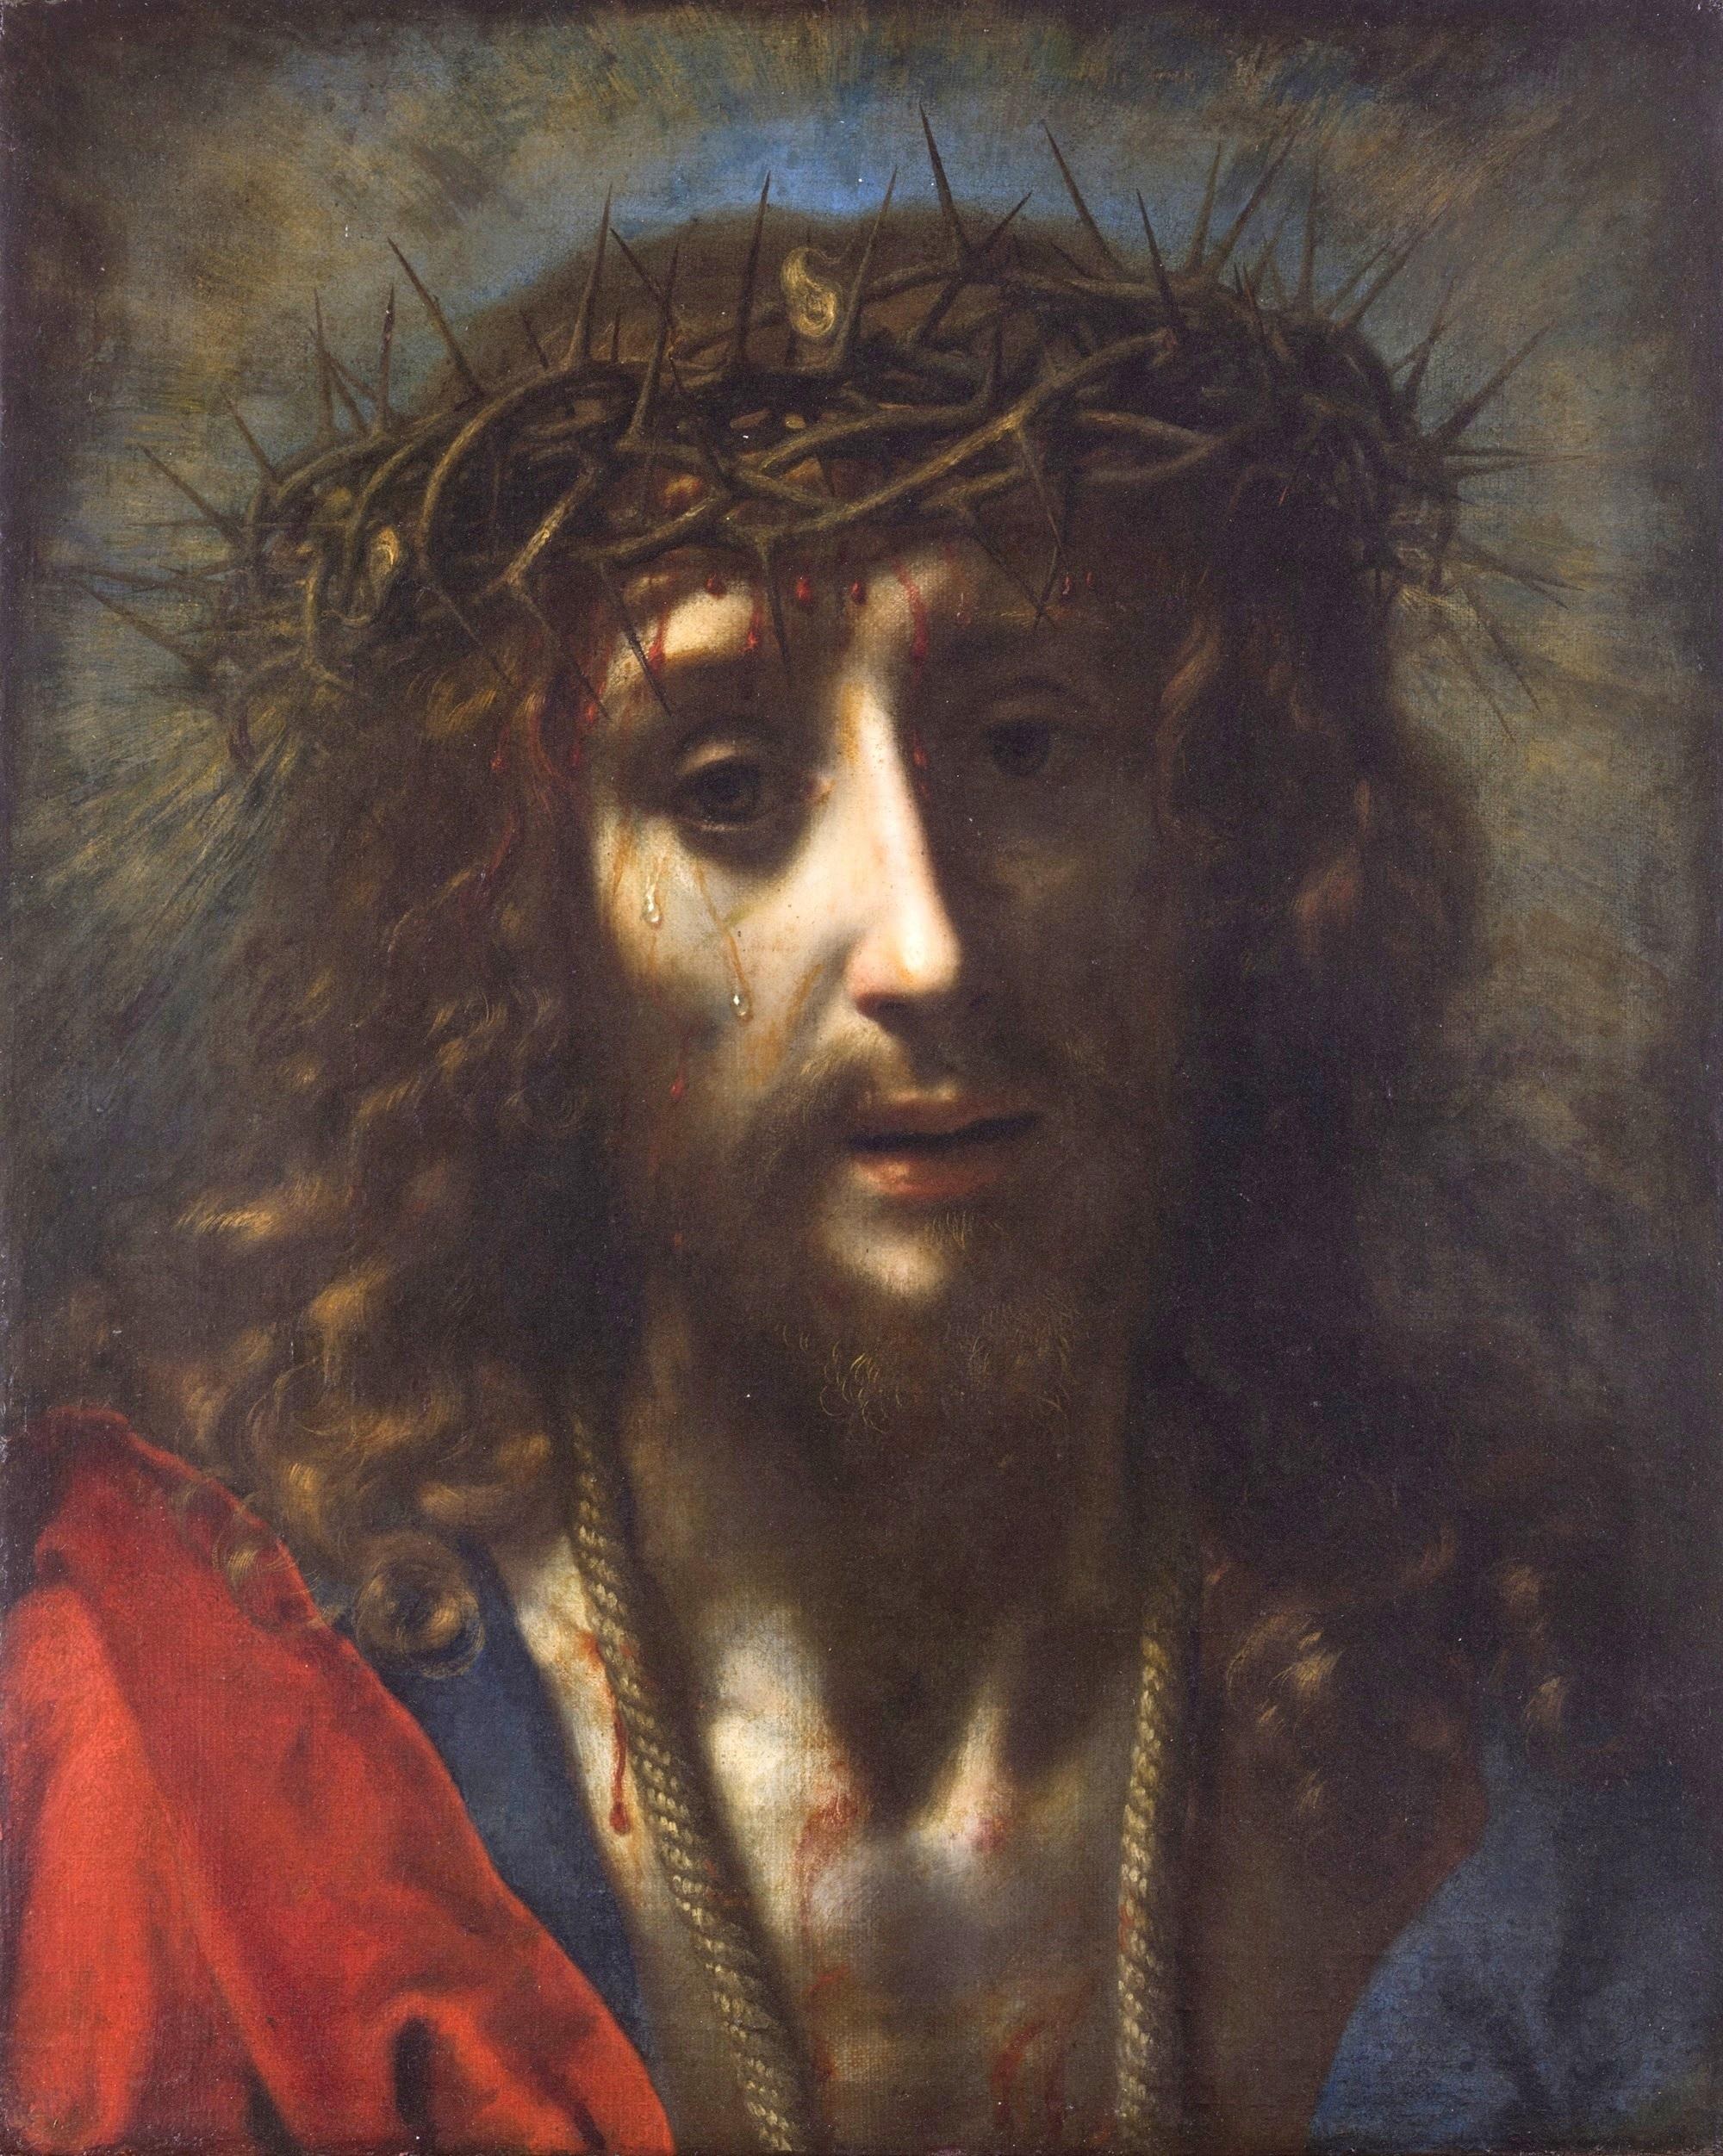 File:Carlo Dolci Ecce Homo.jpg